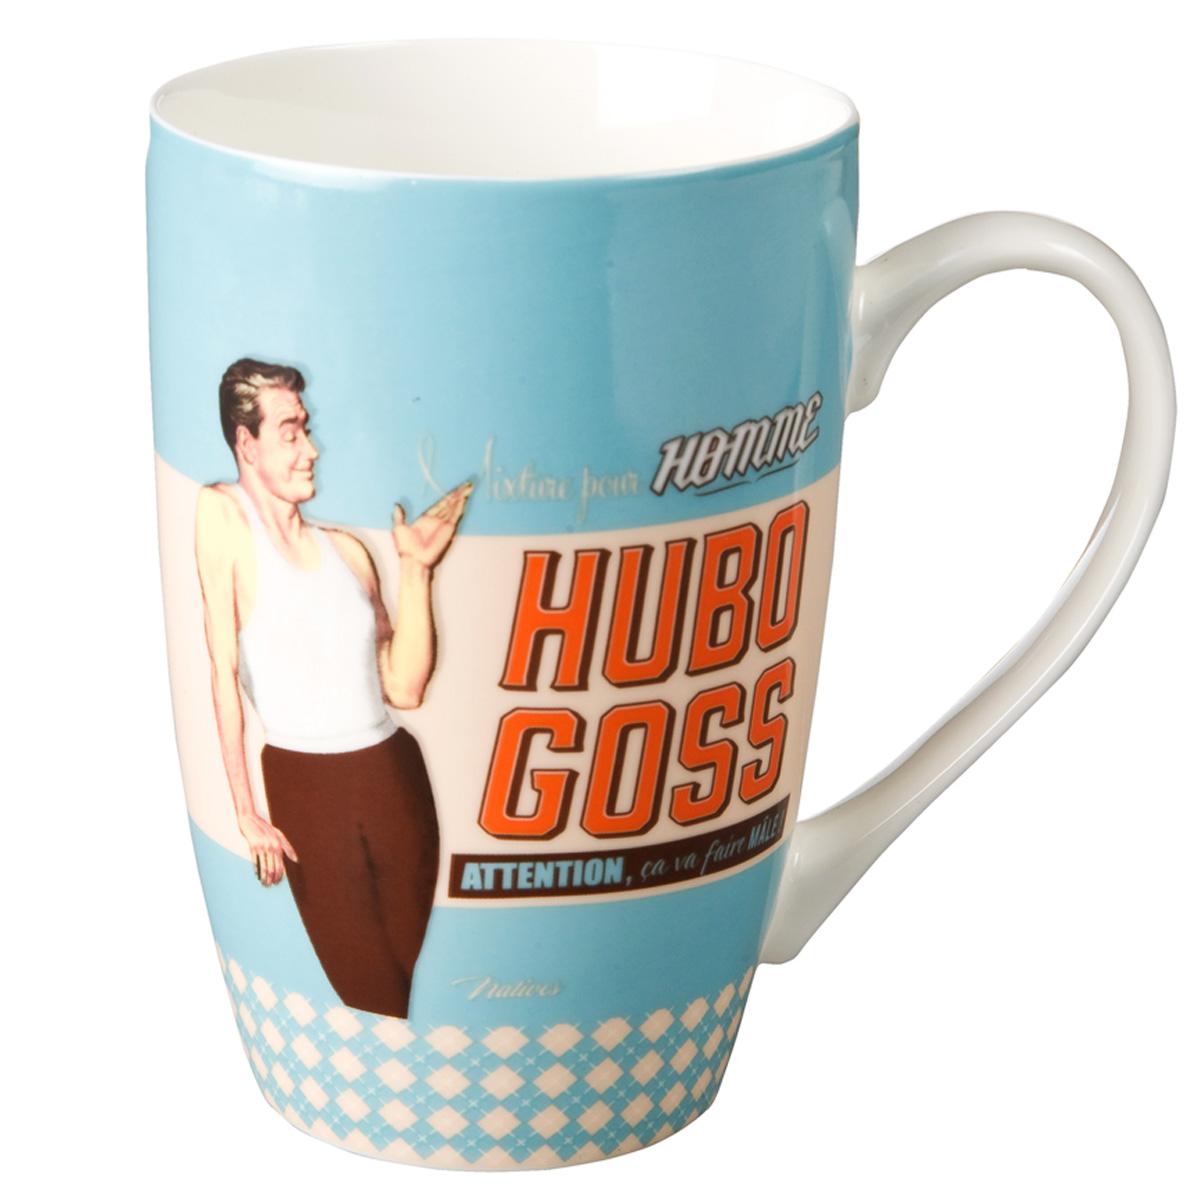 Grand mug porcelaine \'French Vintage\' (Hubo Goss ) - 13x85 cm (46cl) - [Q6976]